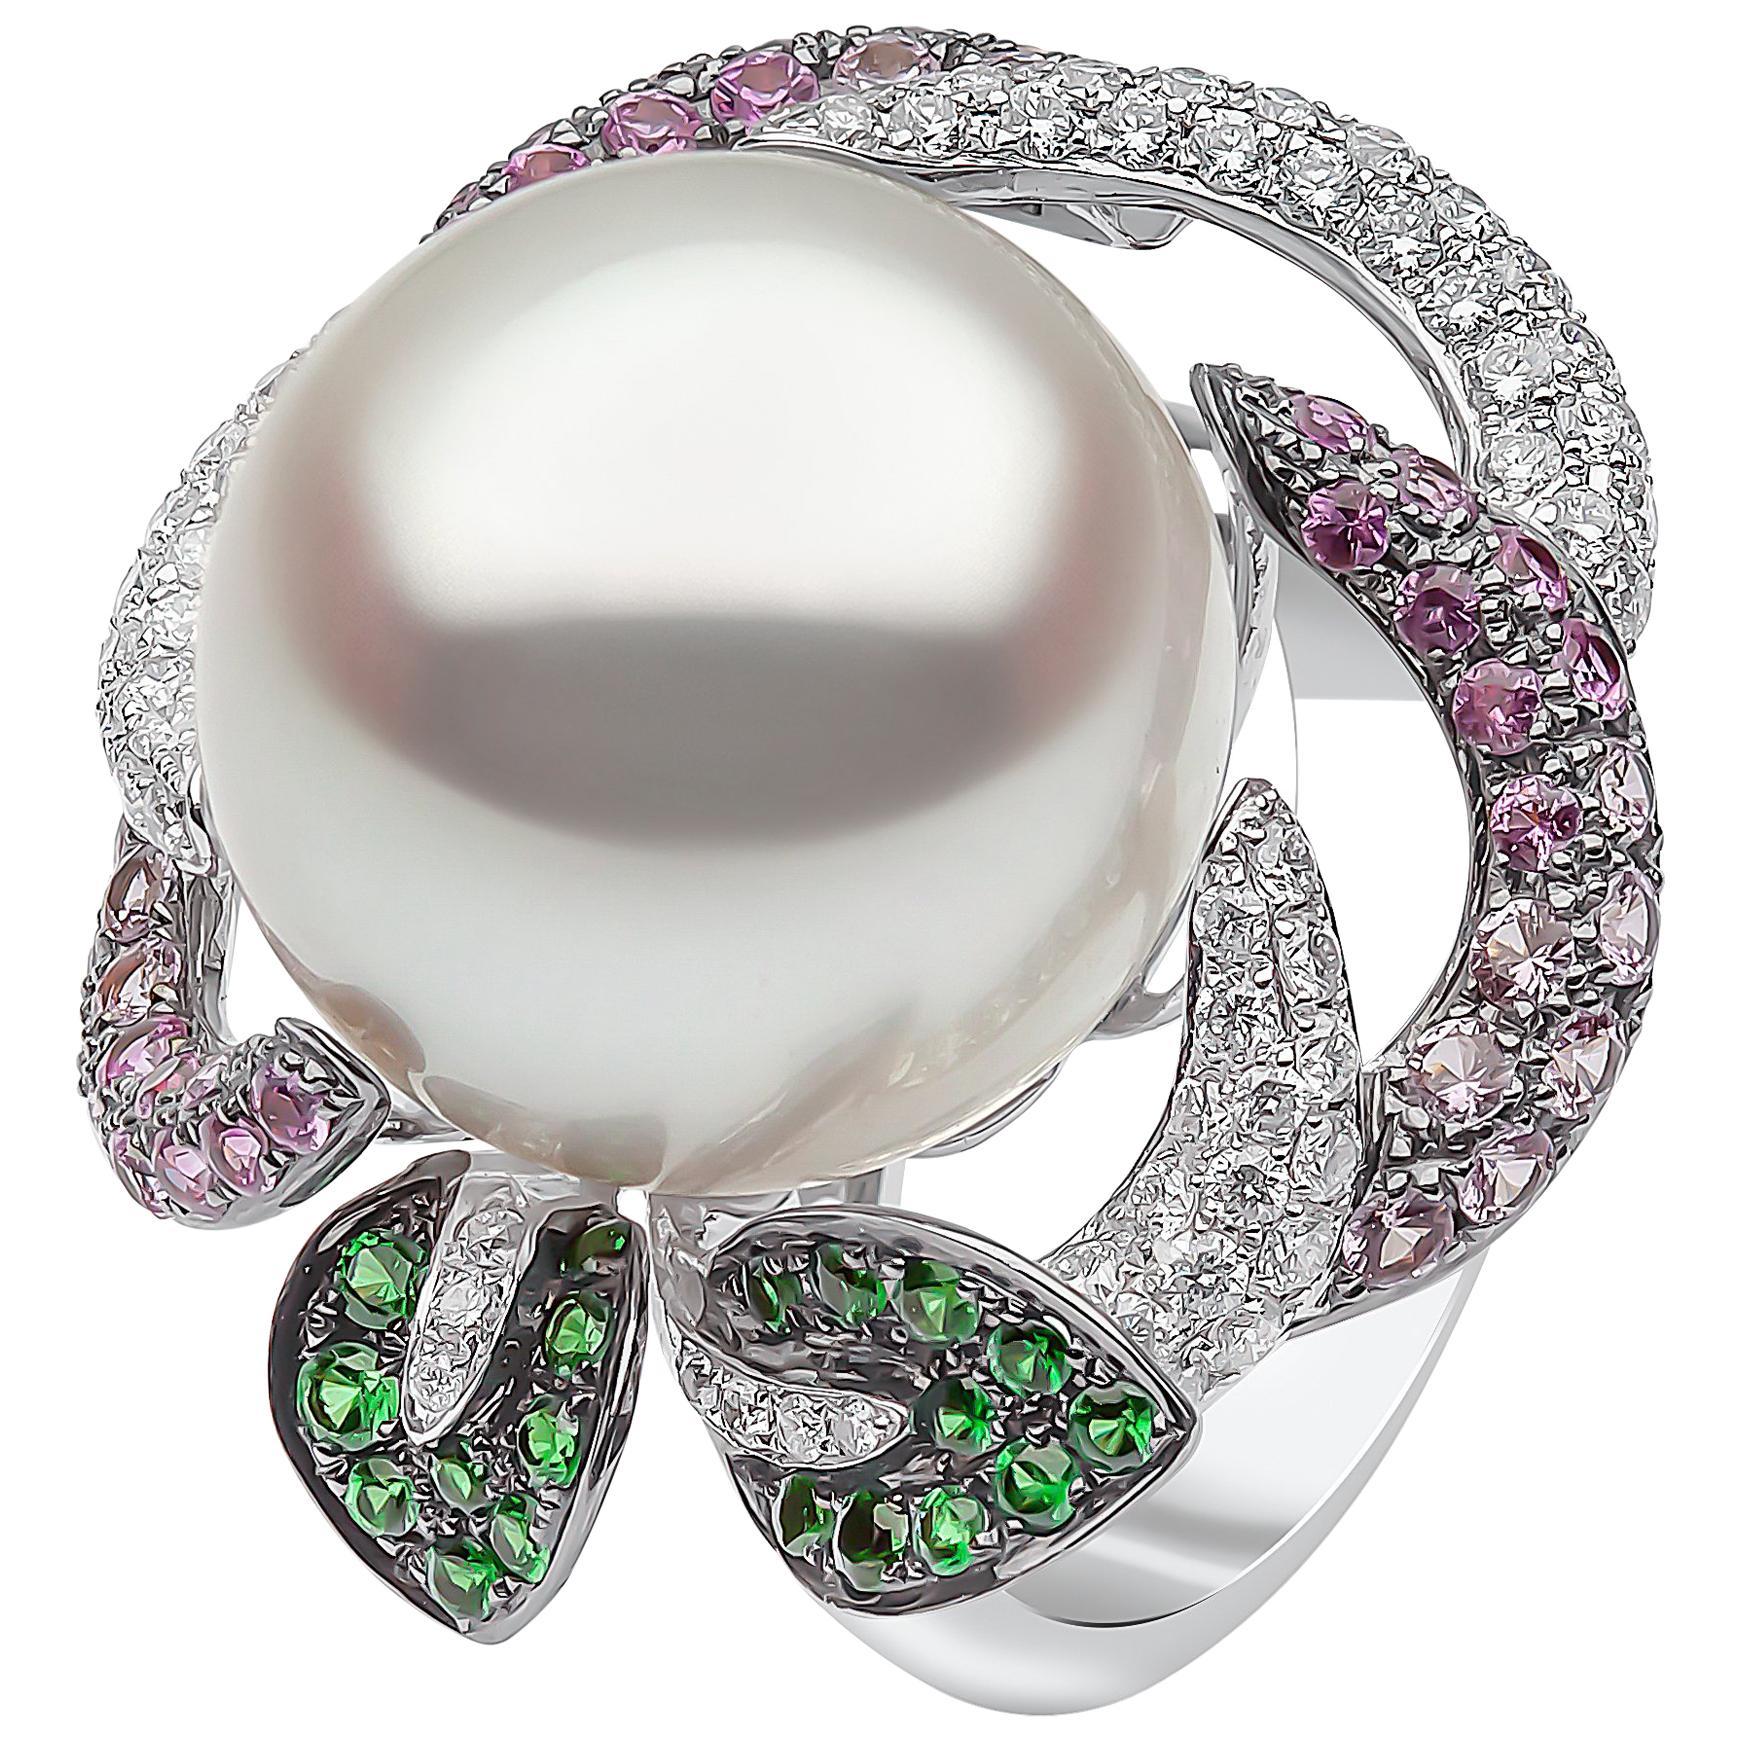 Yoko London South Sea Pearl, Diamond, Sapphire and Garnet Ring in 18 Karat Gold